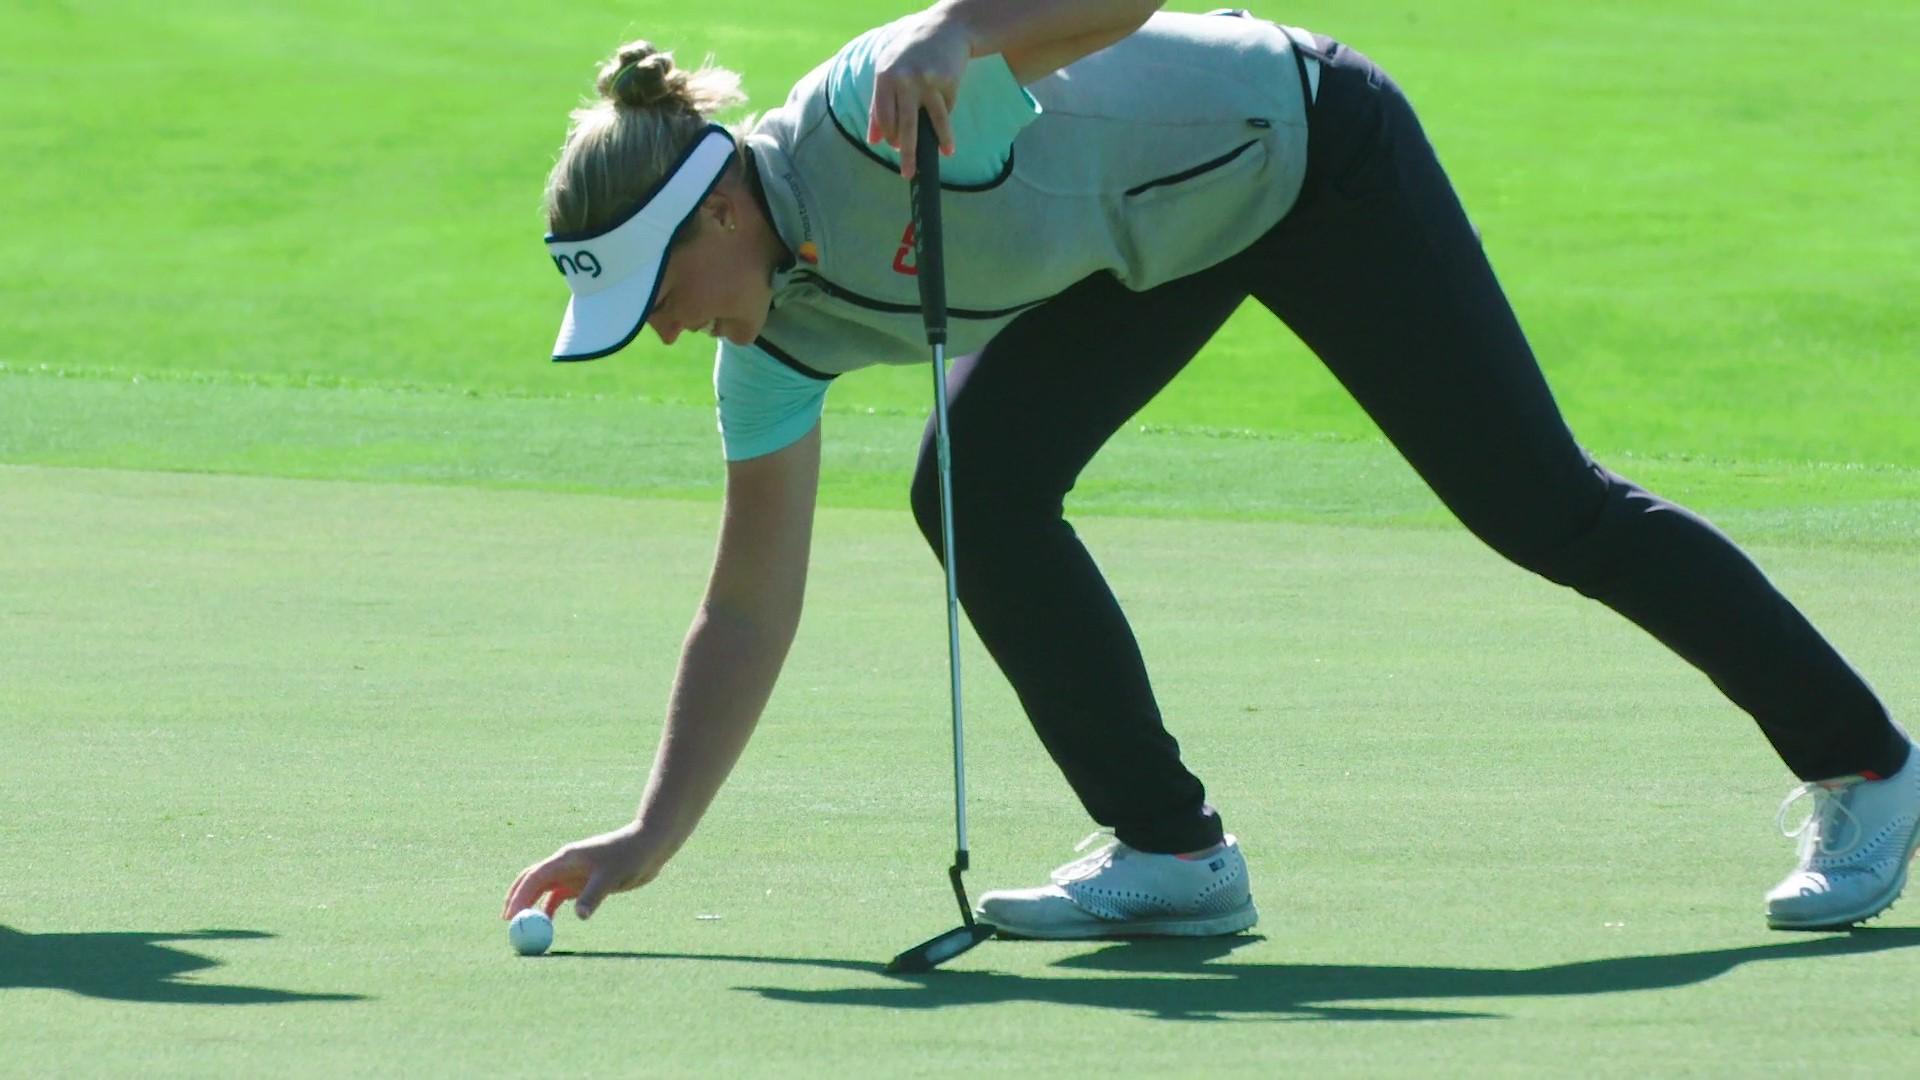 Tickets on Sale Now for LPGA Tour's 2019 Diamond Resorts Tournament of Champions